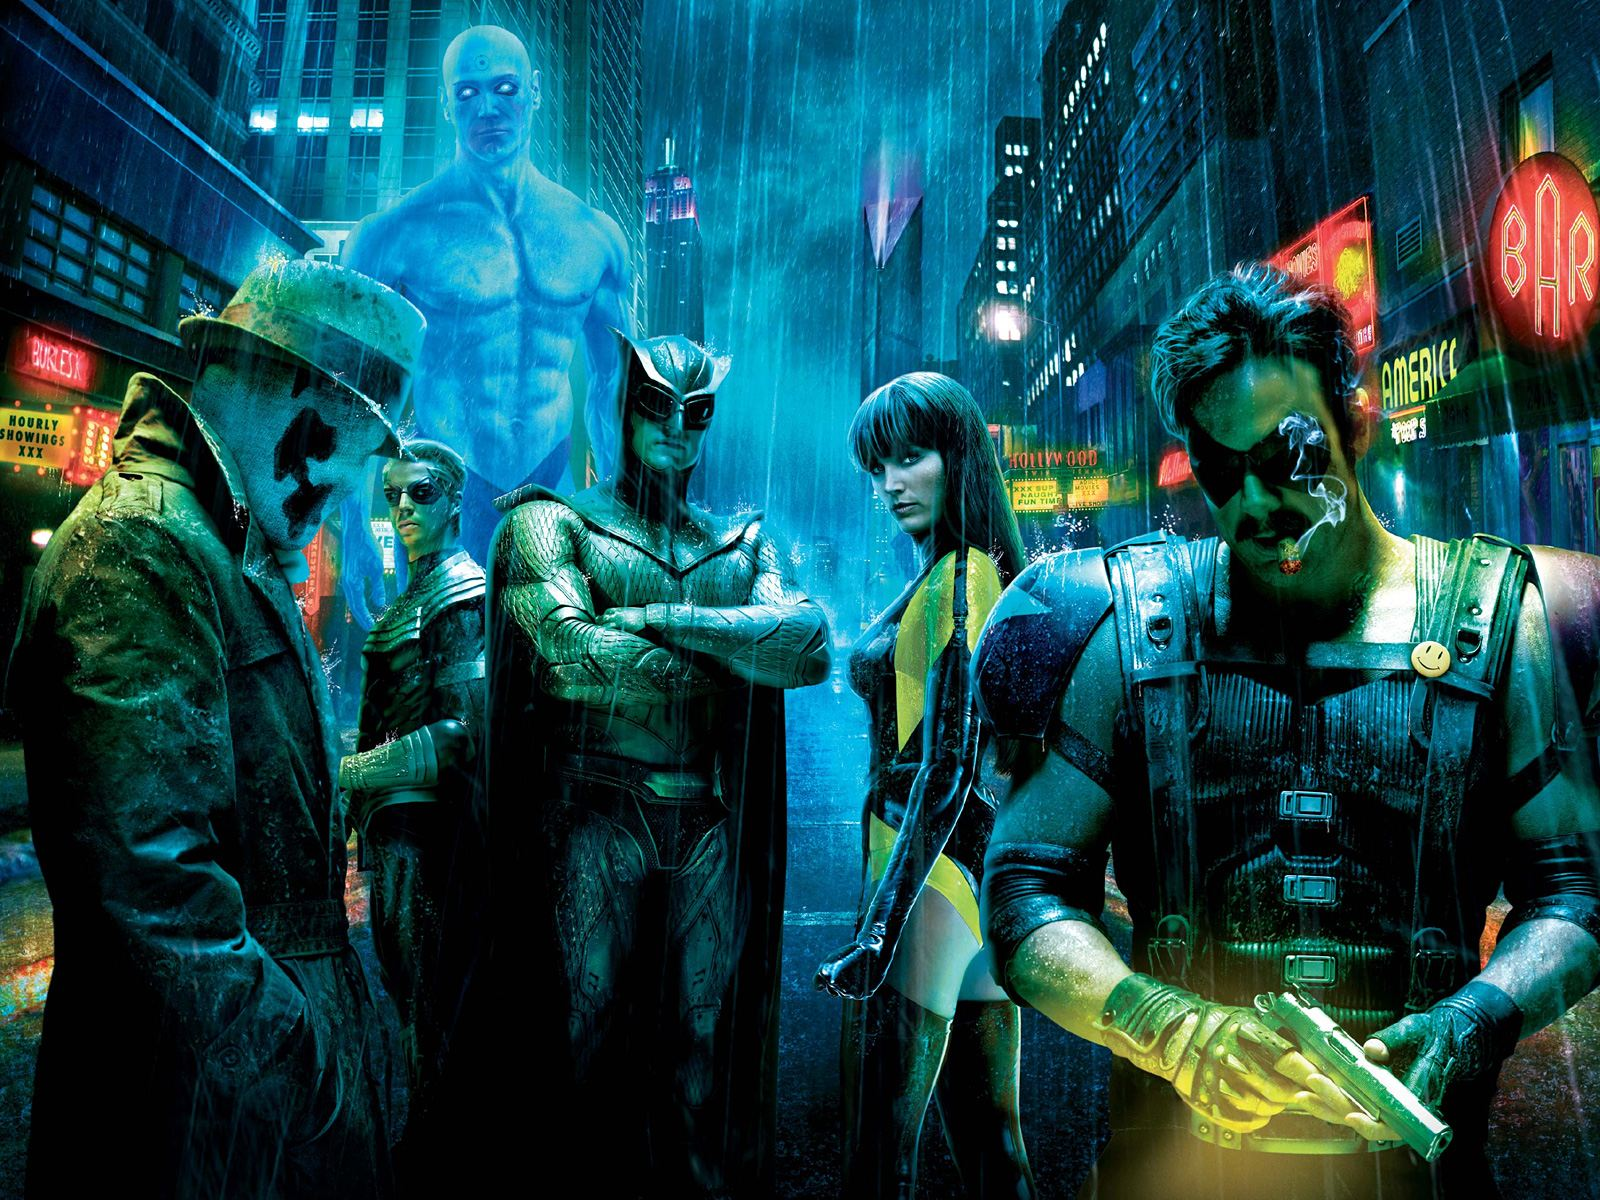 watchmen movie ile ilgili görsel sonucu